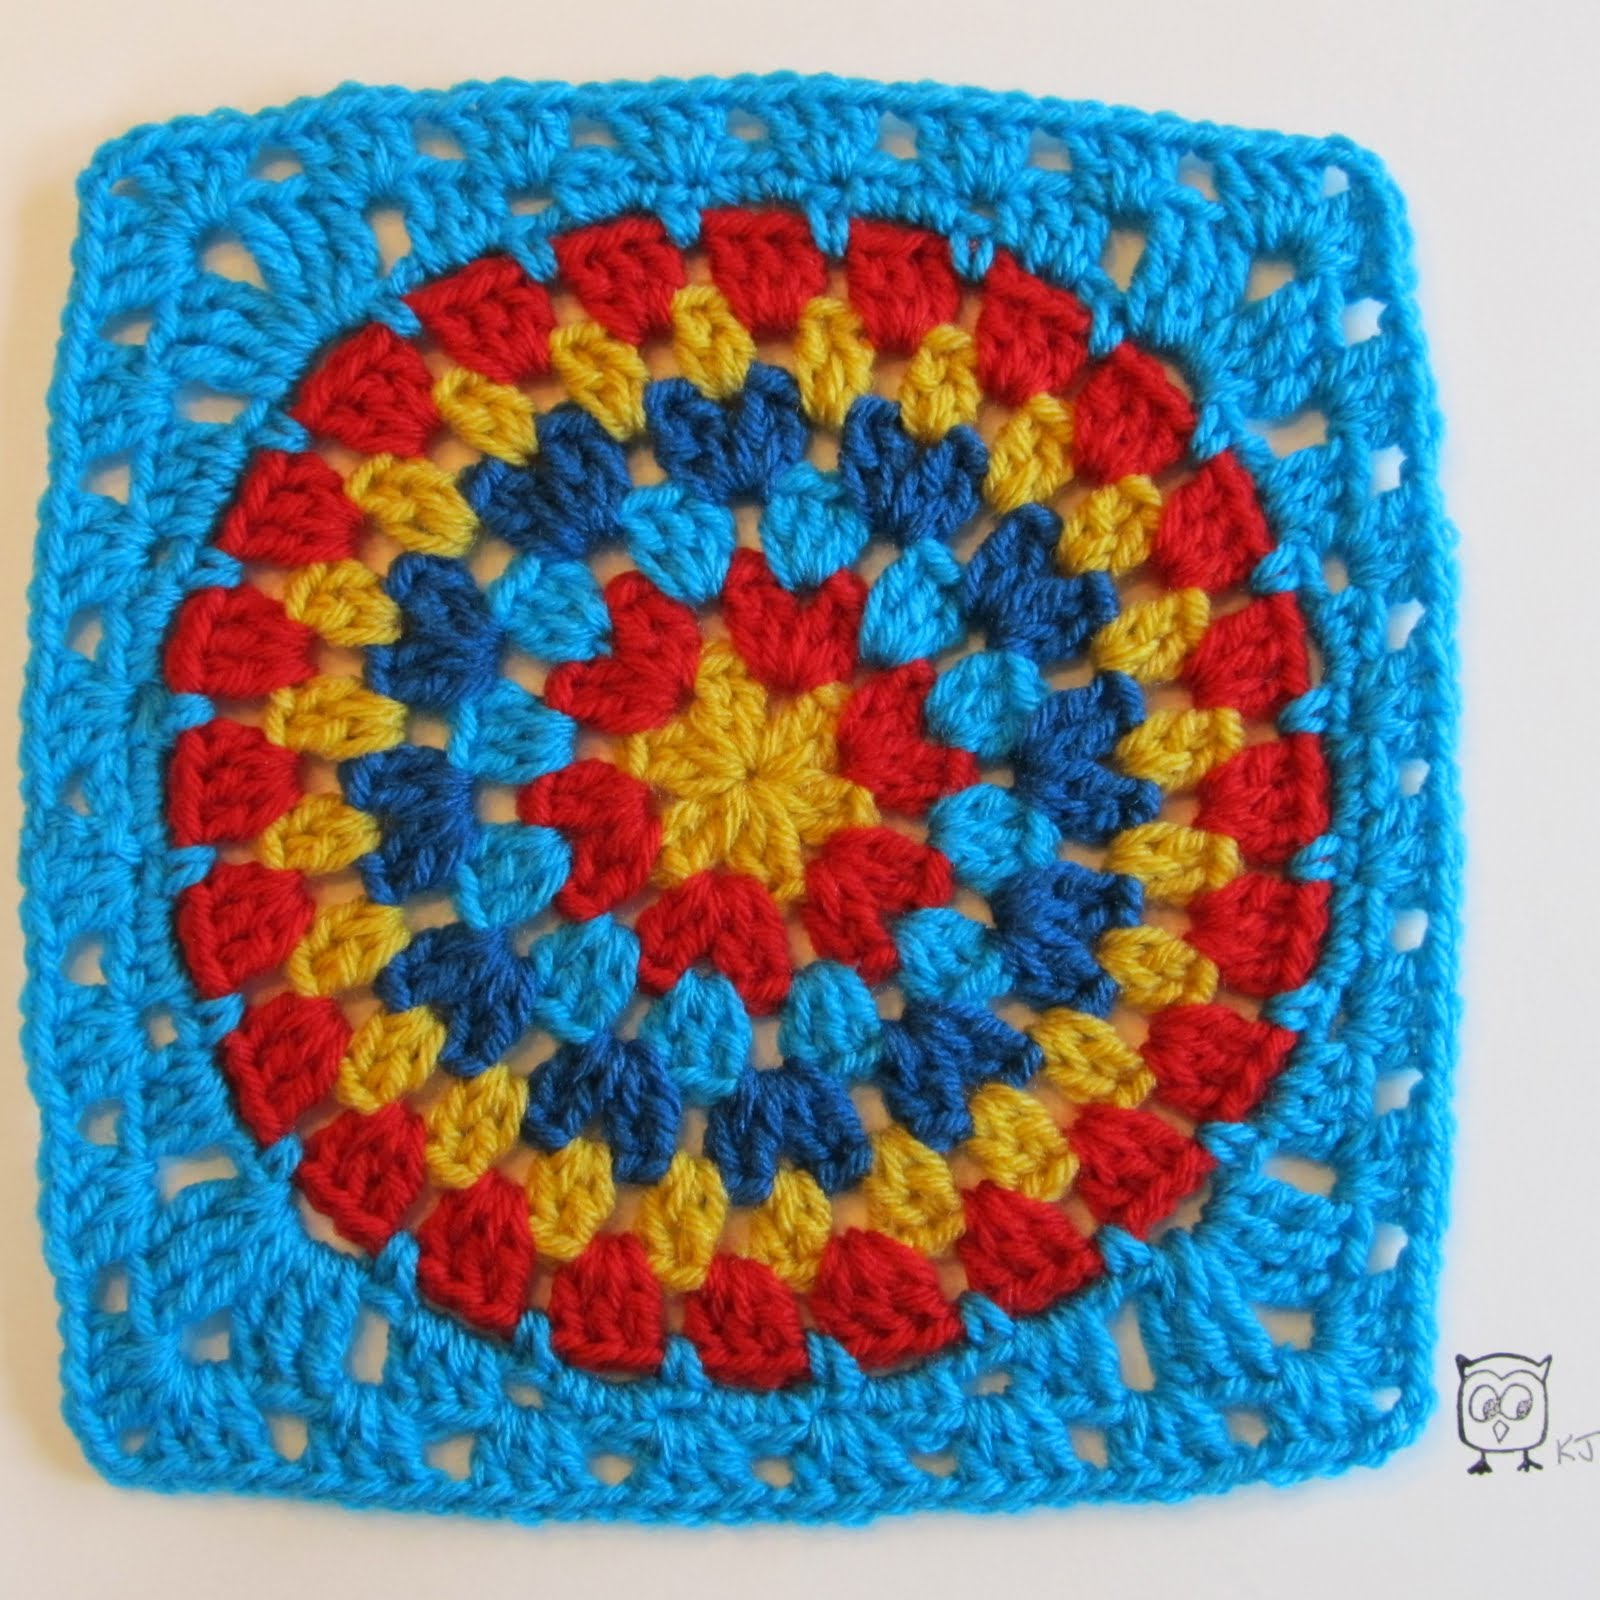 Mes favoris tricot crochet tuto crochet comment faire un rond dans un carr - Comment faire un carre ...